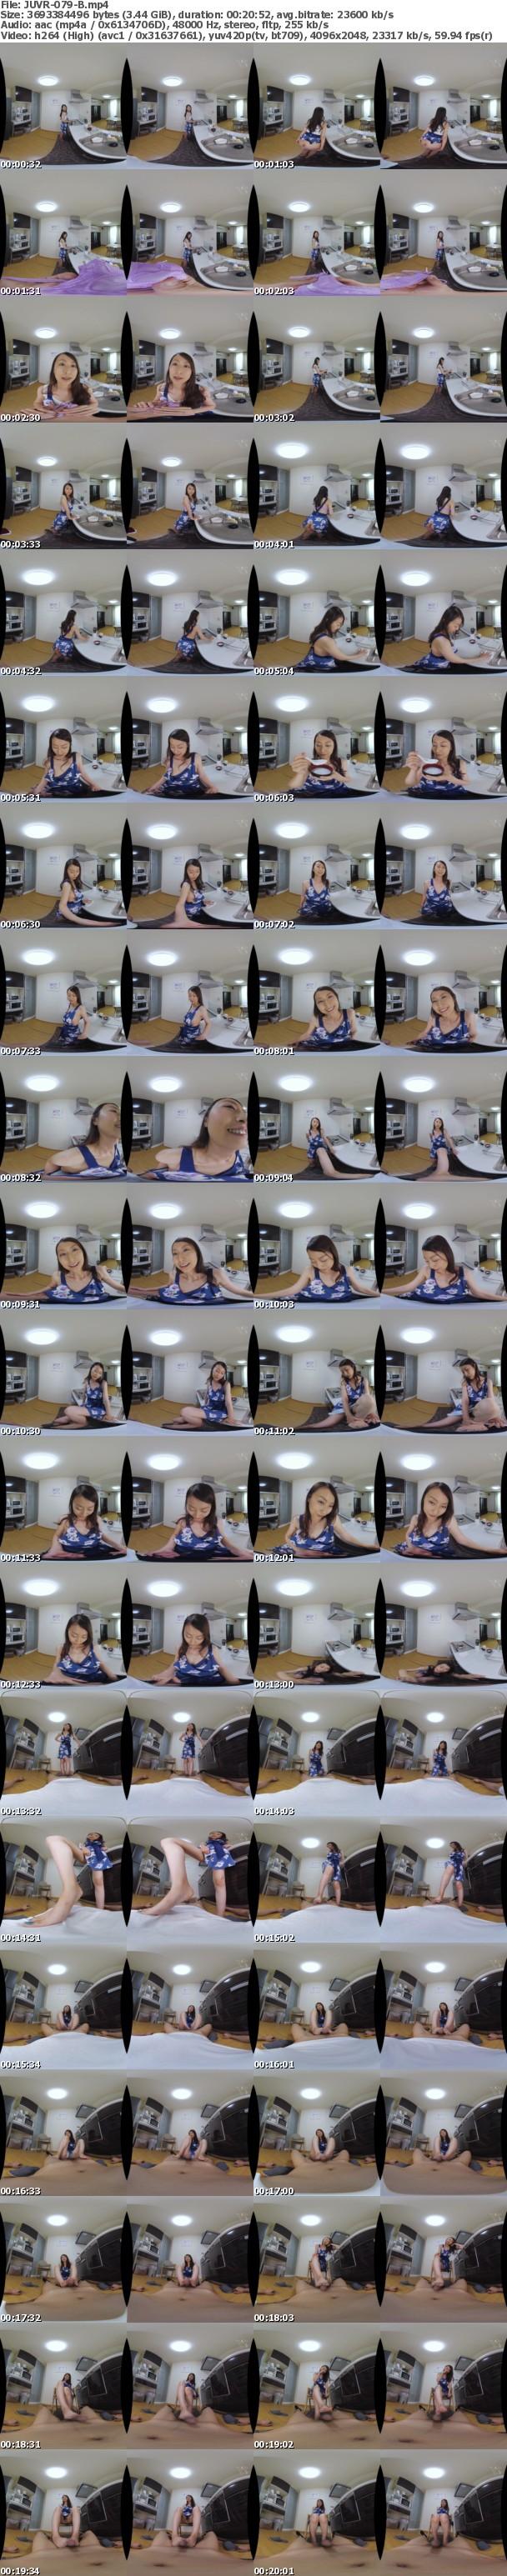 (VR) JUVR-079 妻の看病を口実に夫婦喧嘩で家出してきた欲求不満なドS義姉に焦らされ続けて絶対服従を誓わされた年下の僕 青木玲